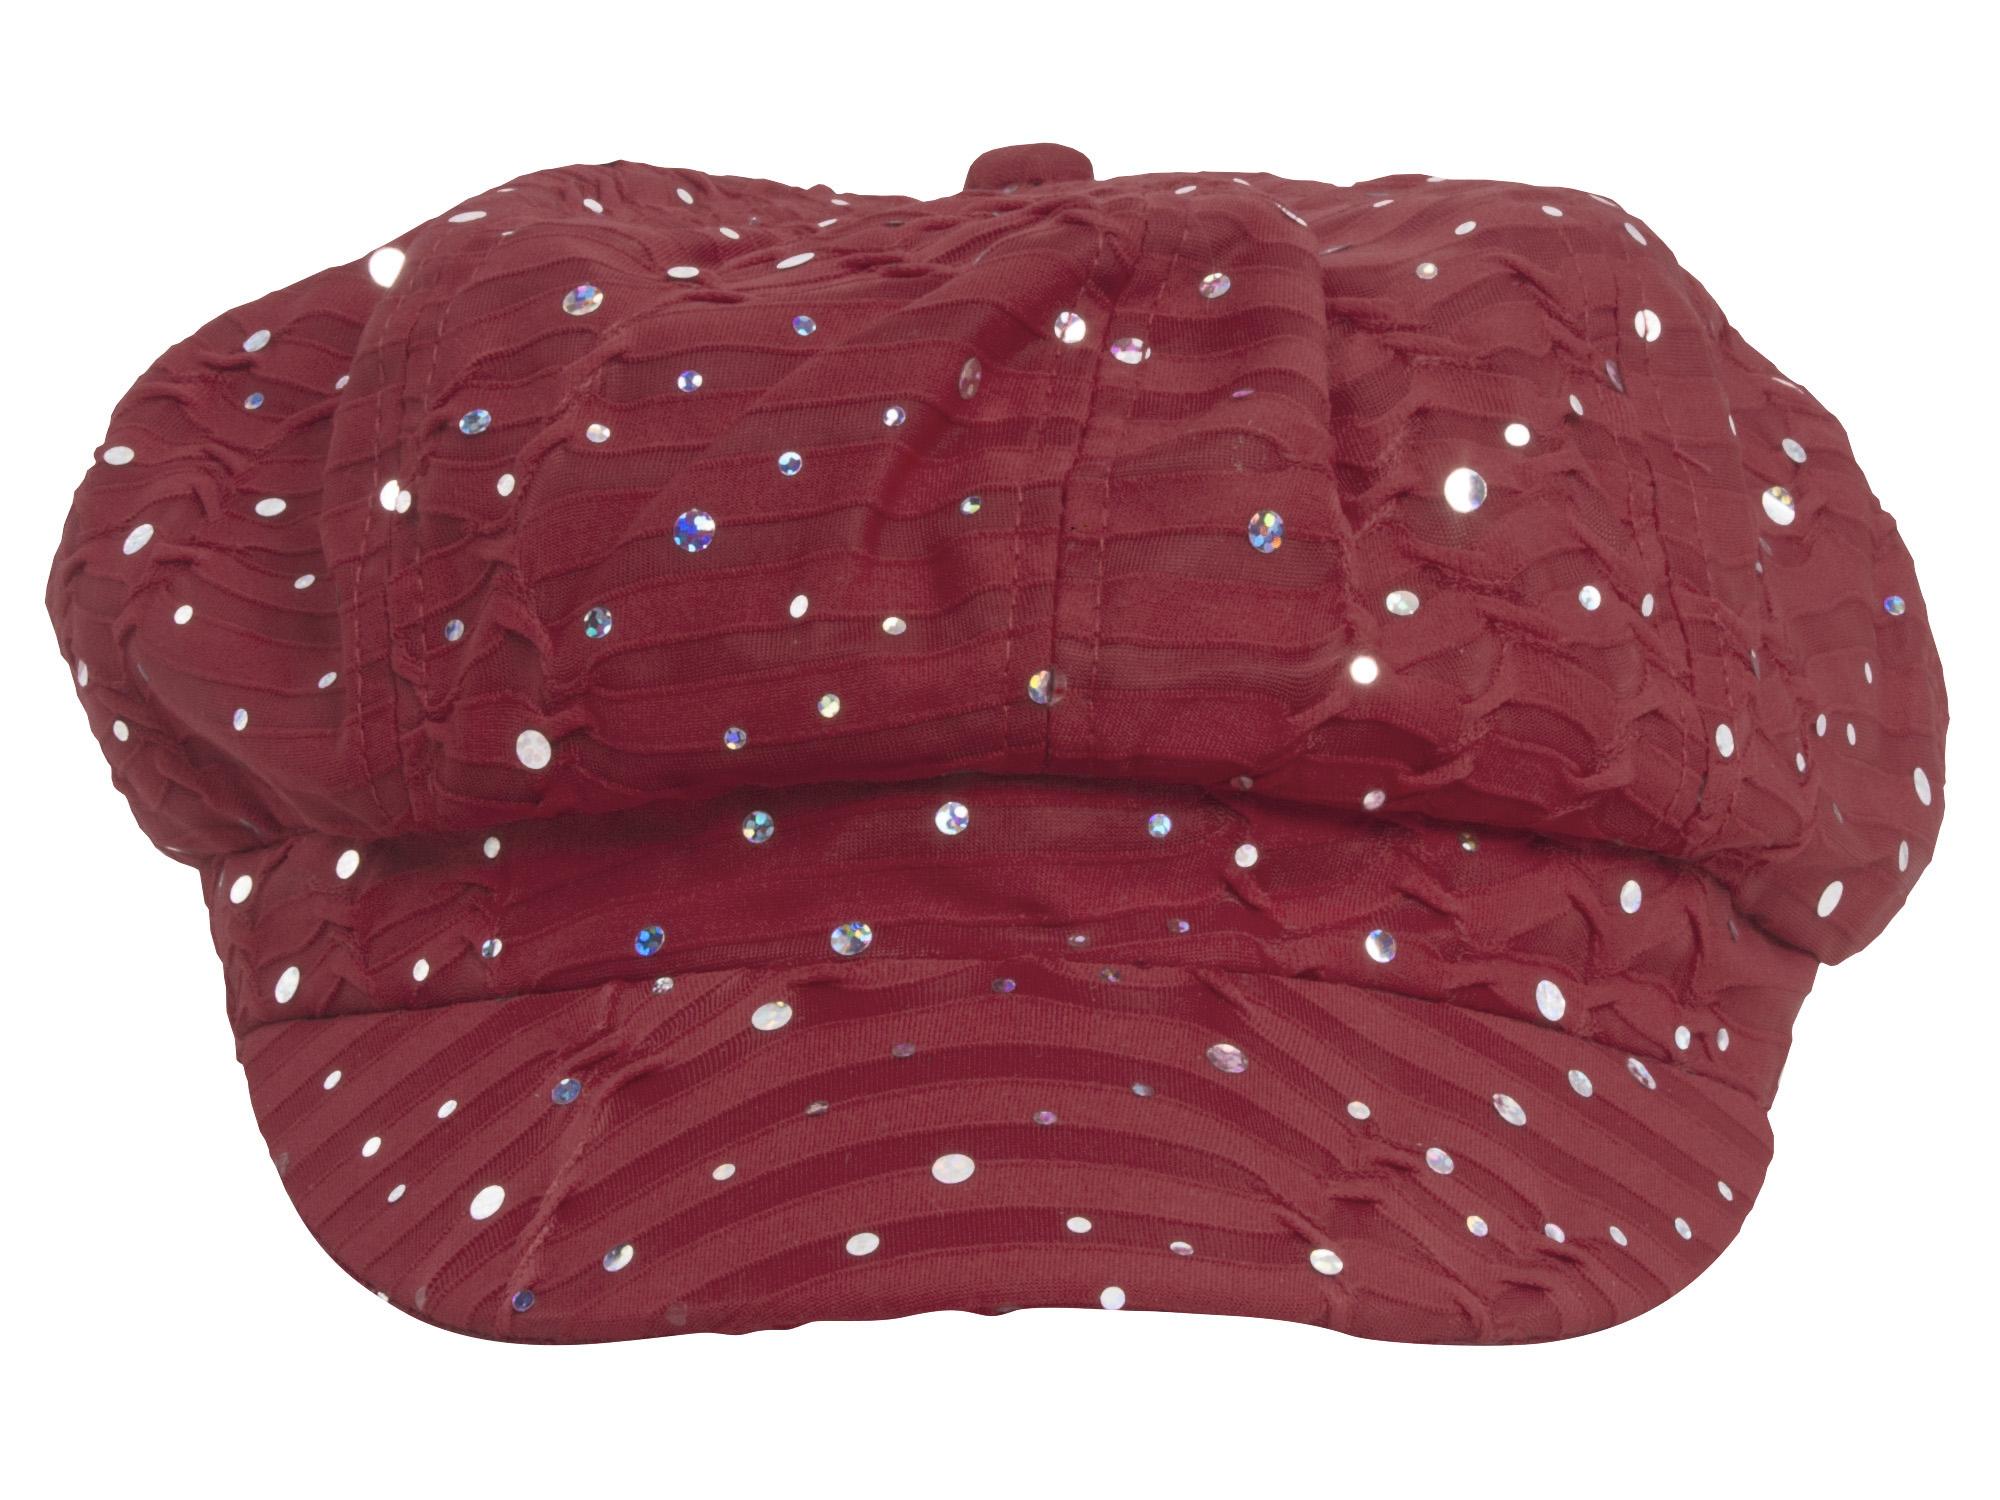 Women-039-s-Glitter-Sequin-Trim-Newsboy-Style-Relaxed-Fit-Hat-Cap thumbnail 38